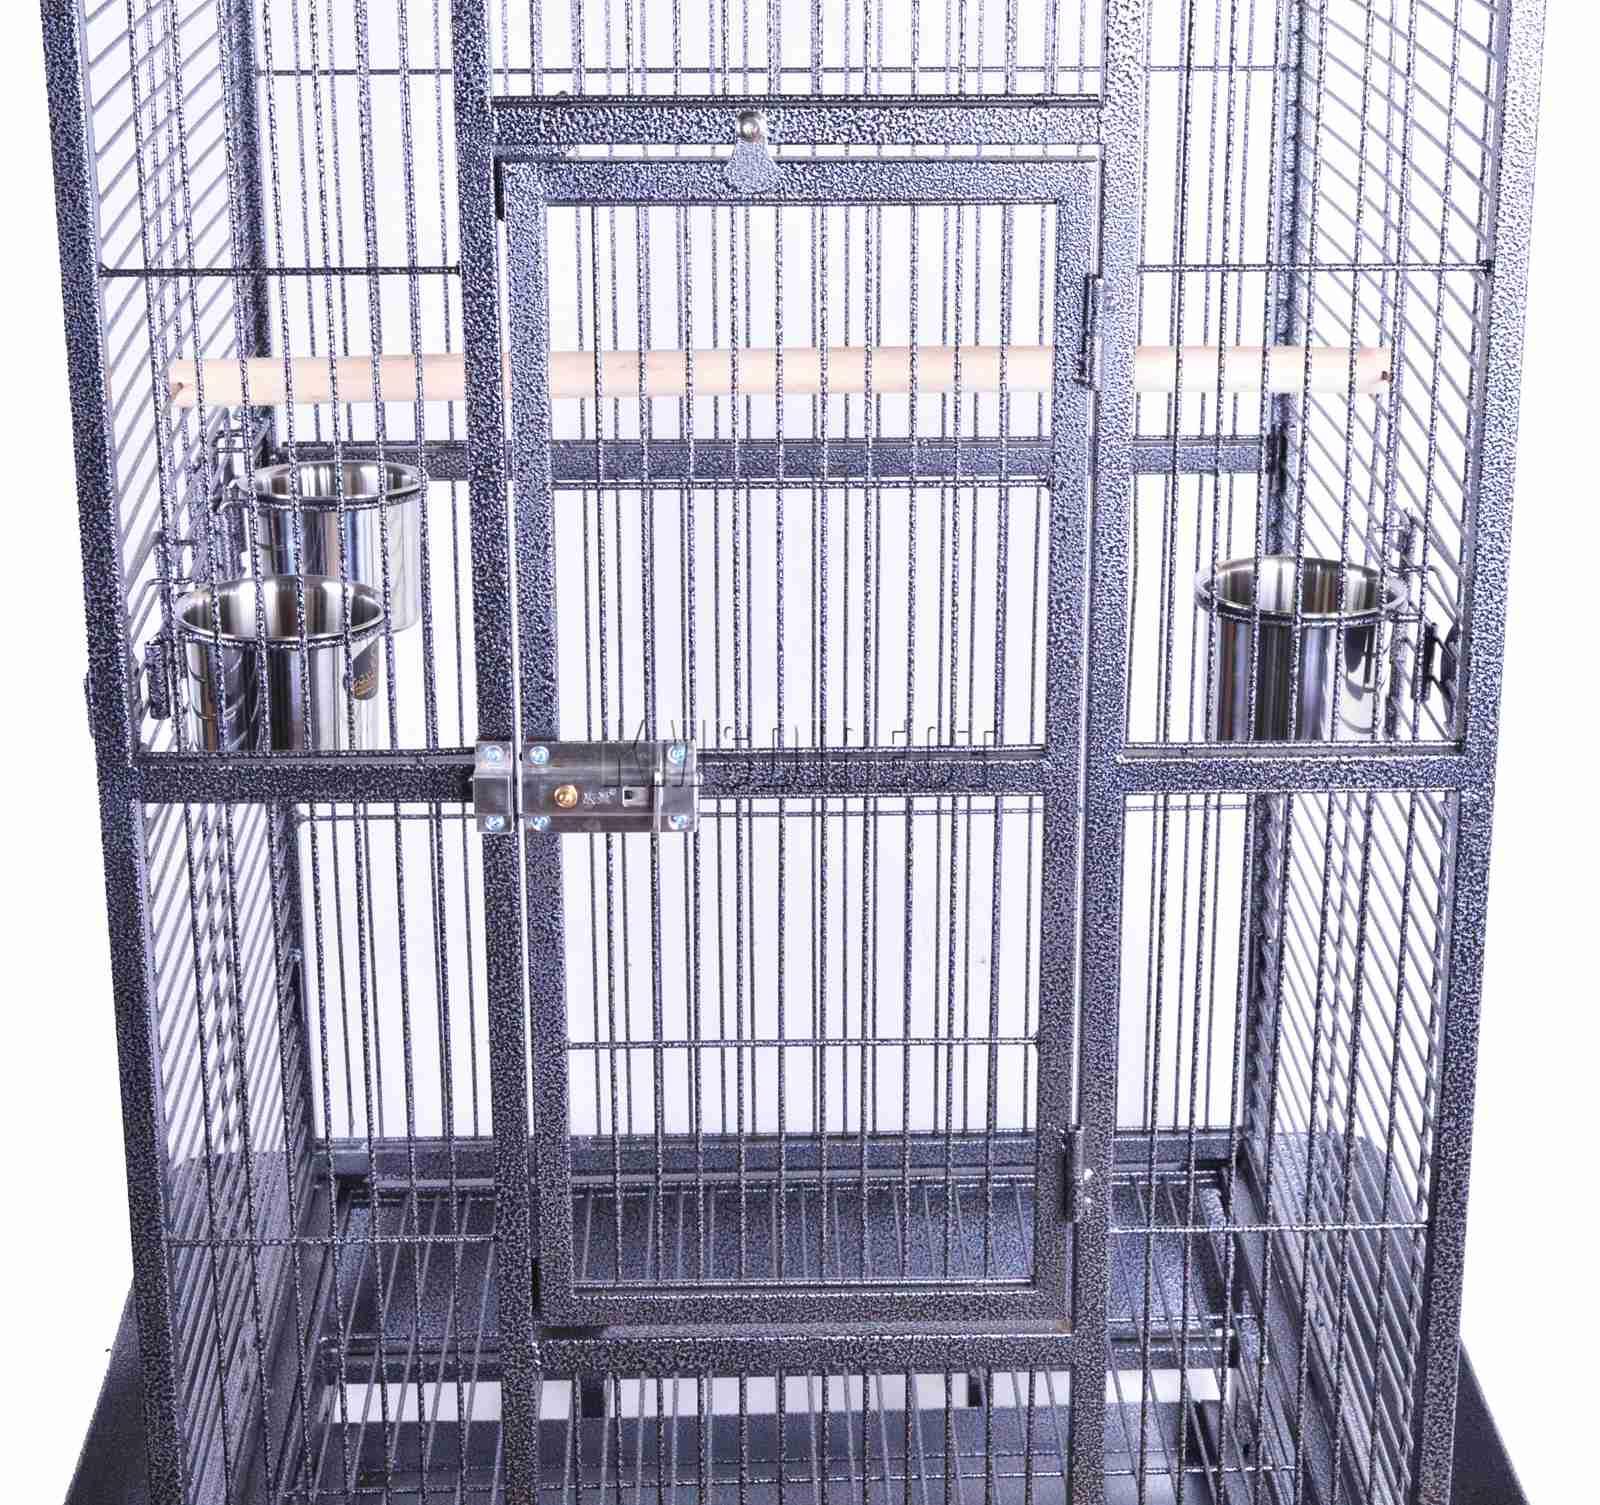 121998112507 2475 I 225 26 BIRD CAGE METAL MBC 01 HAMMERED SILVER KMSWM0505 - Foxhunter Grande Metal Jaula con Soporte Pajarera Loro Periquito Canario Cacatua